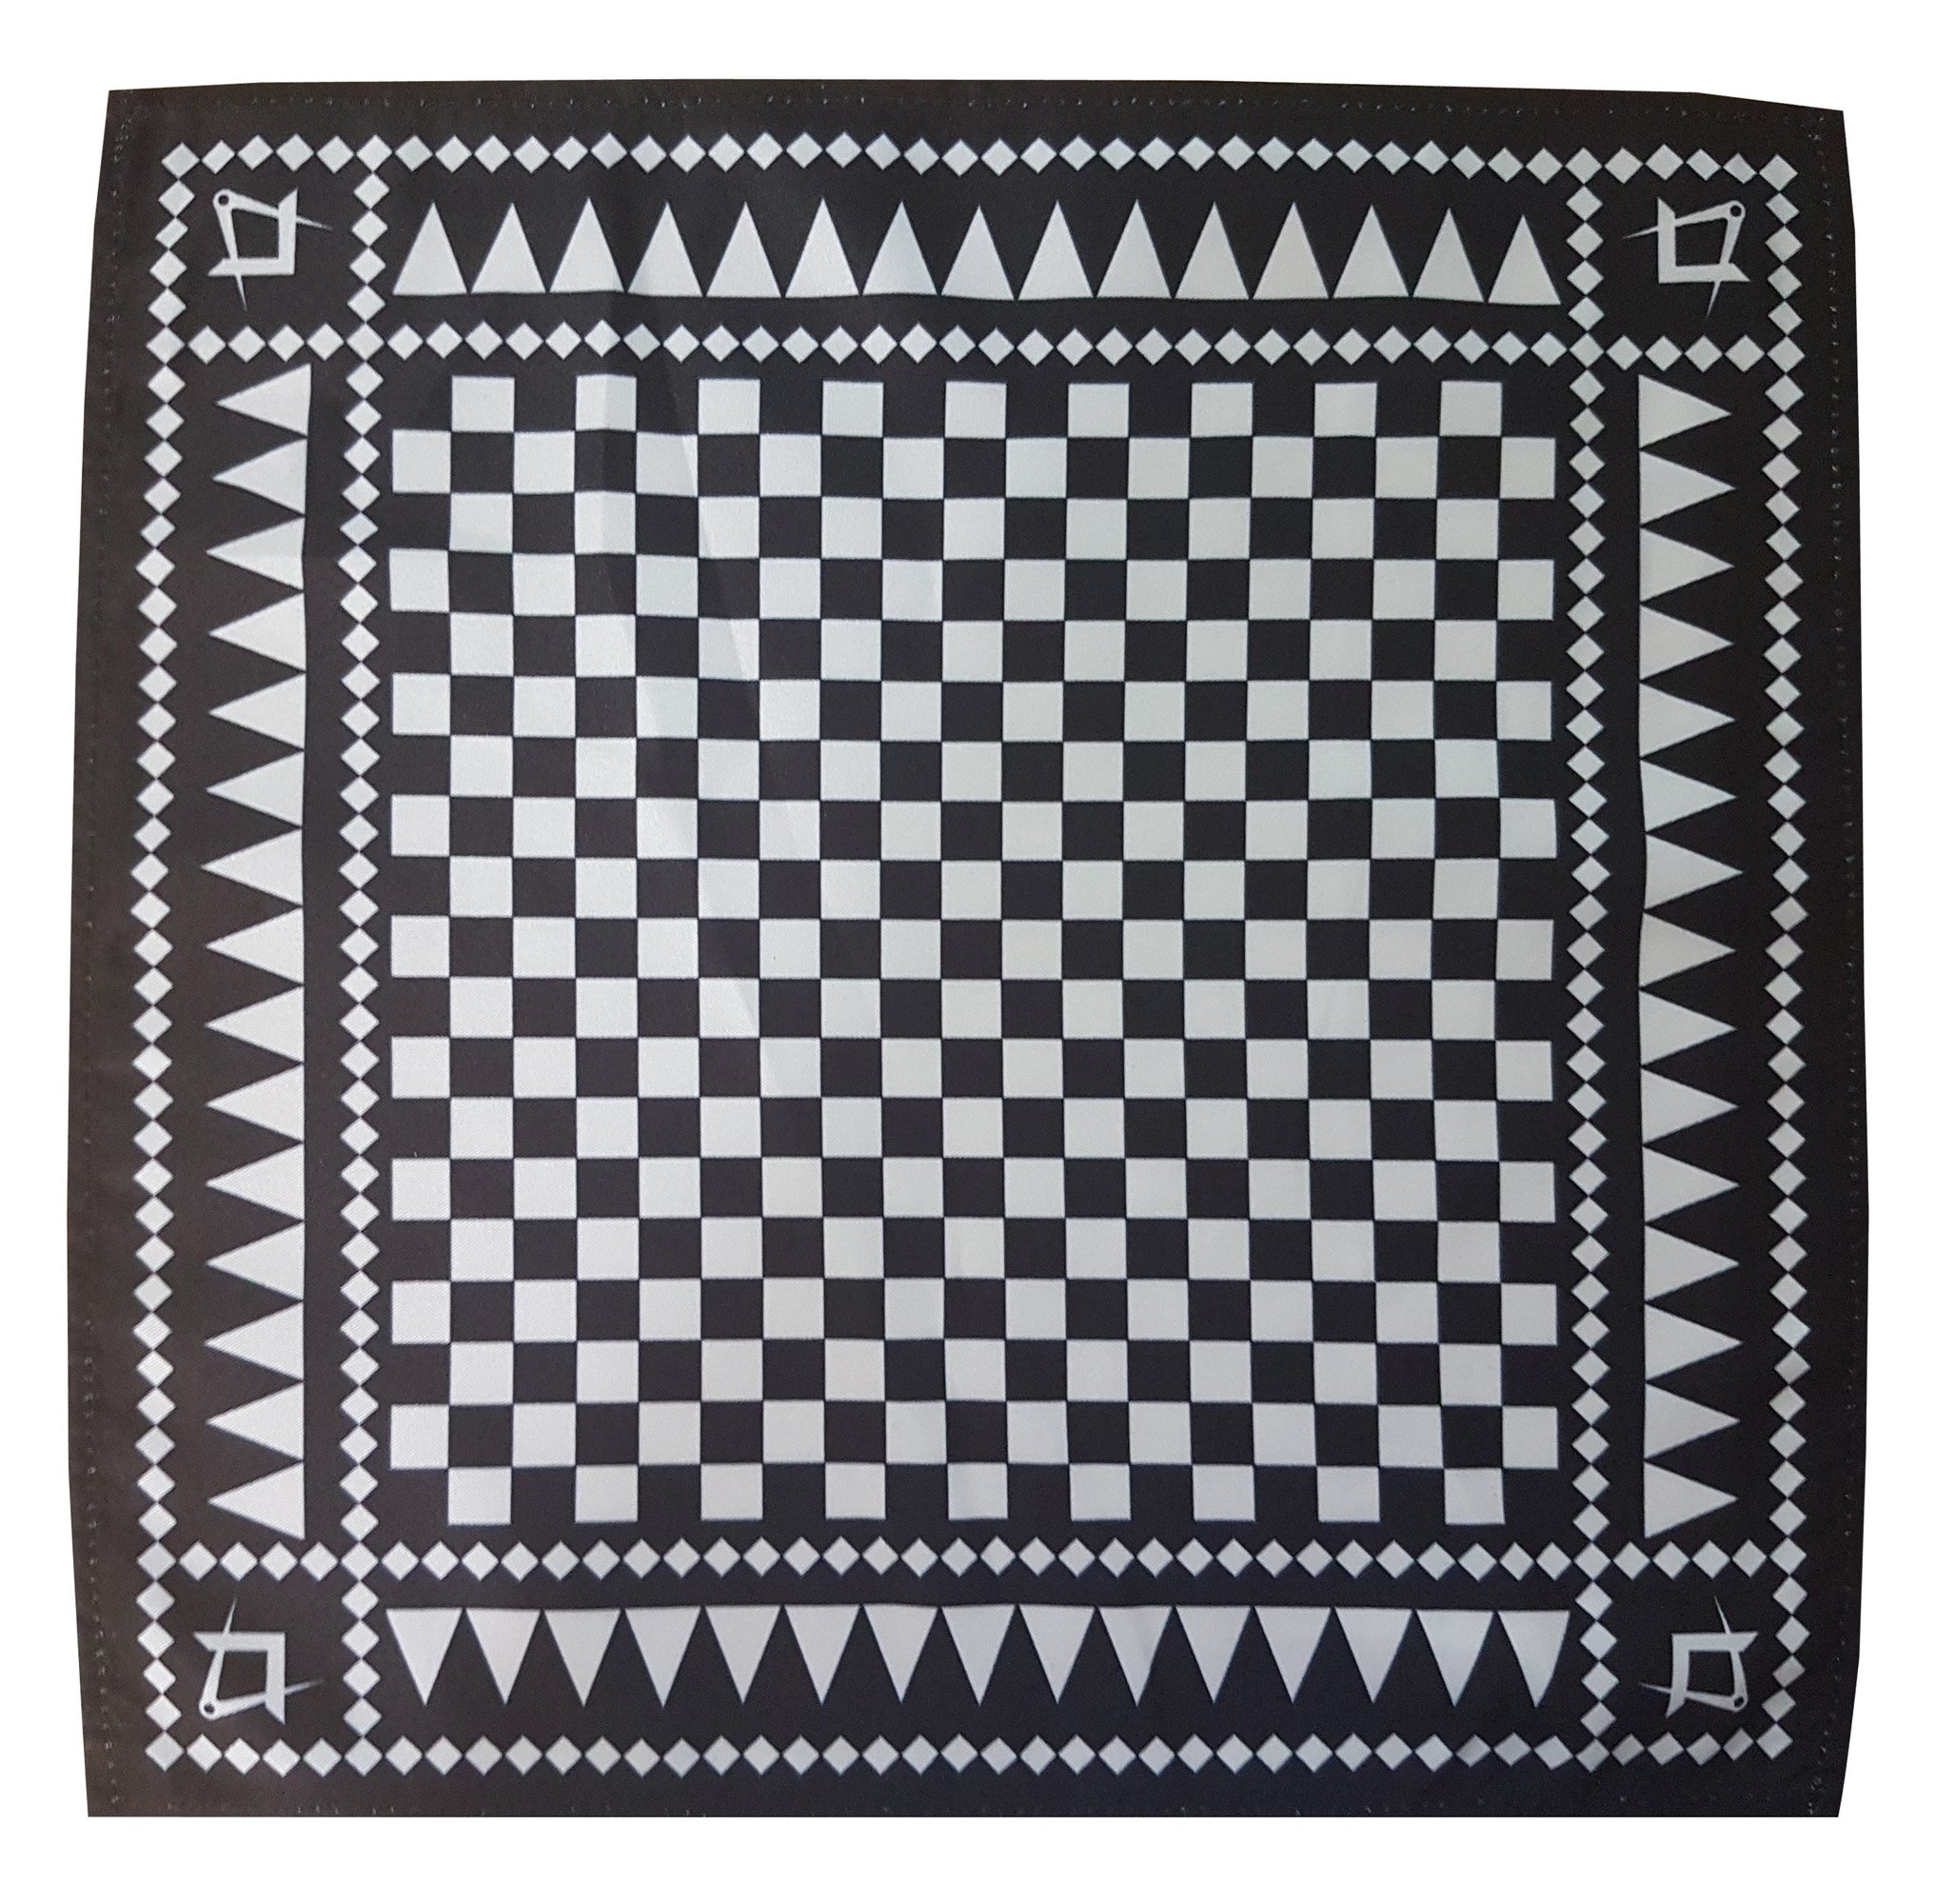 Freemasons Masonic Handkerchief Pocket Square S/&C